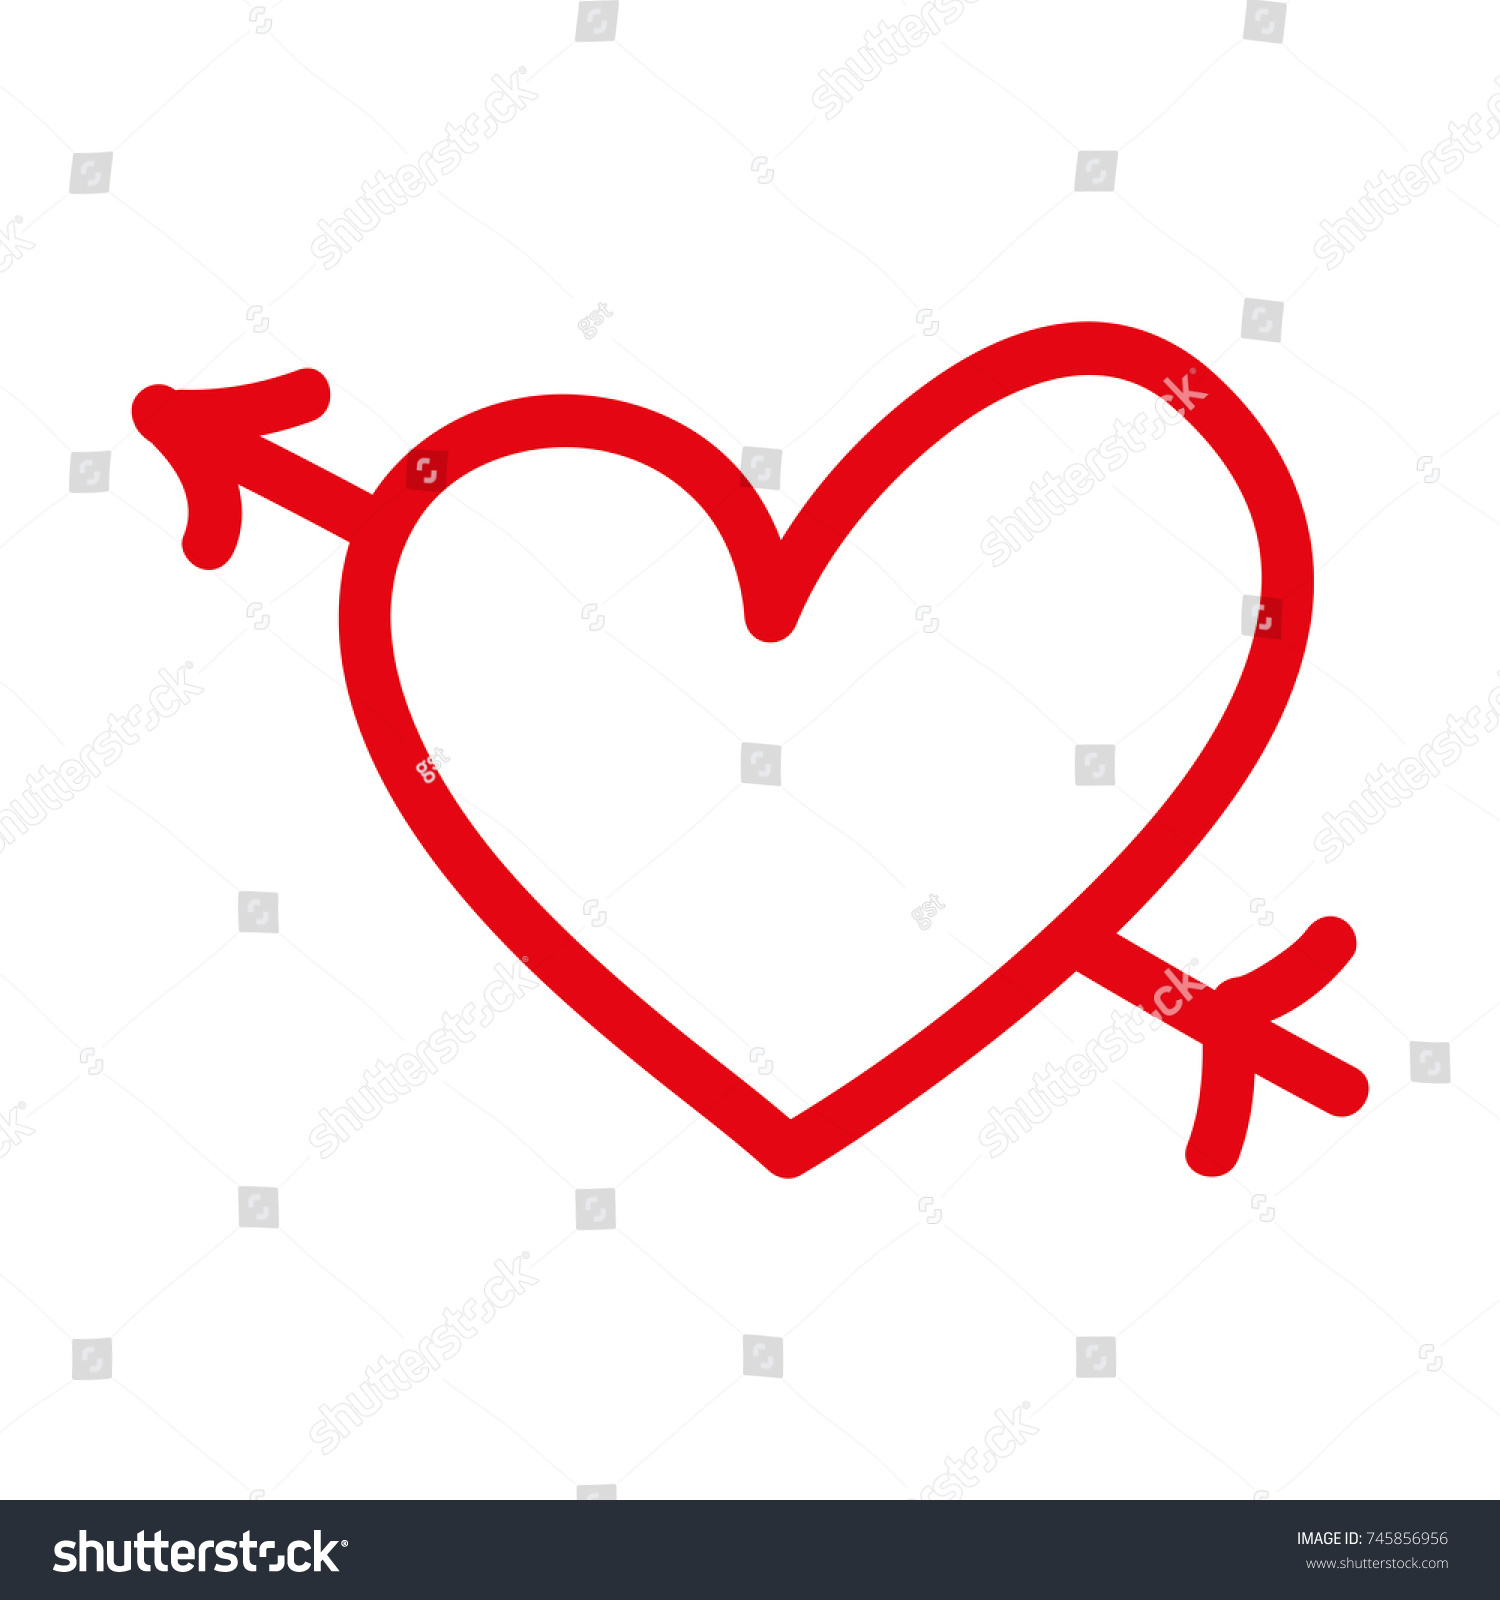 1500x1600 Valentine Symbols Clip Art Stock Vector Romantic Heart Love Arrow